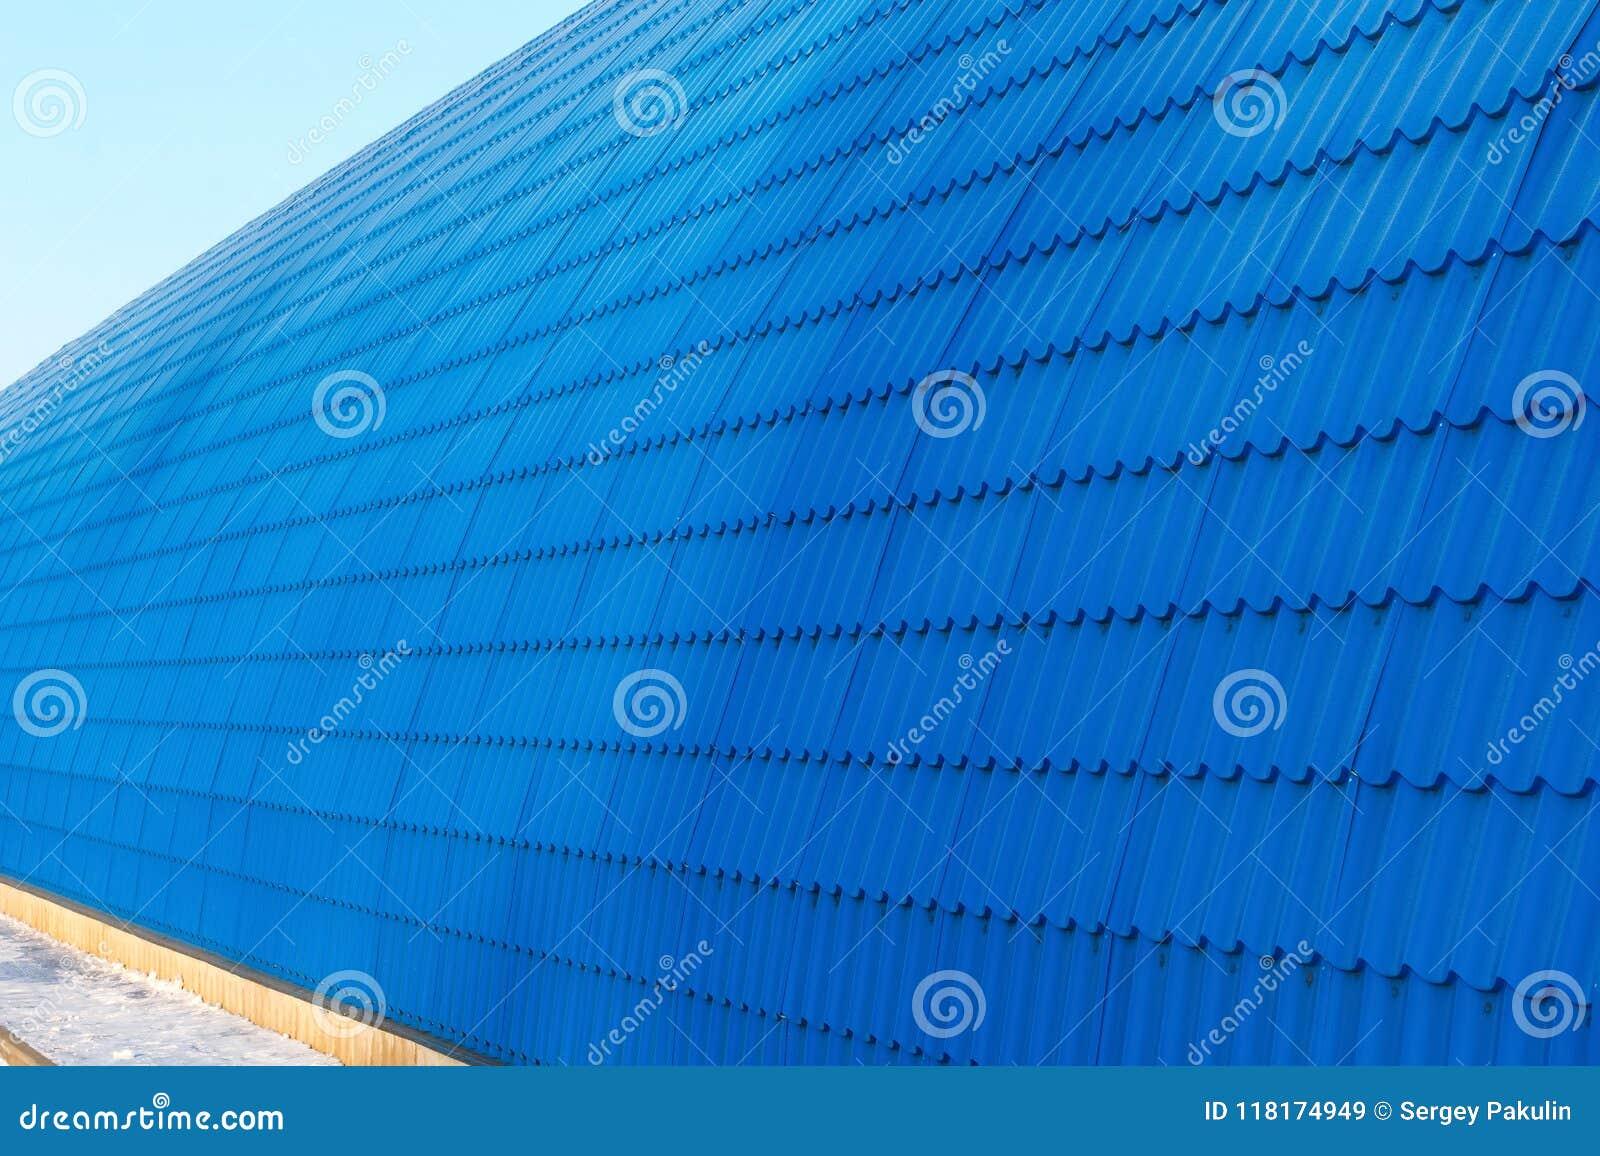 Perspektywa hangar ściana od błękit płytki